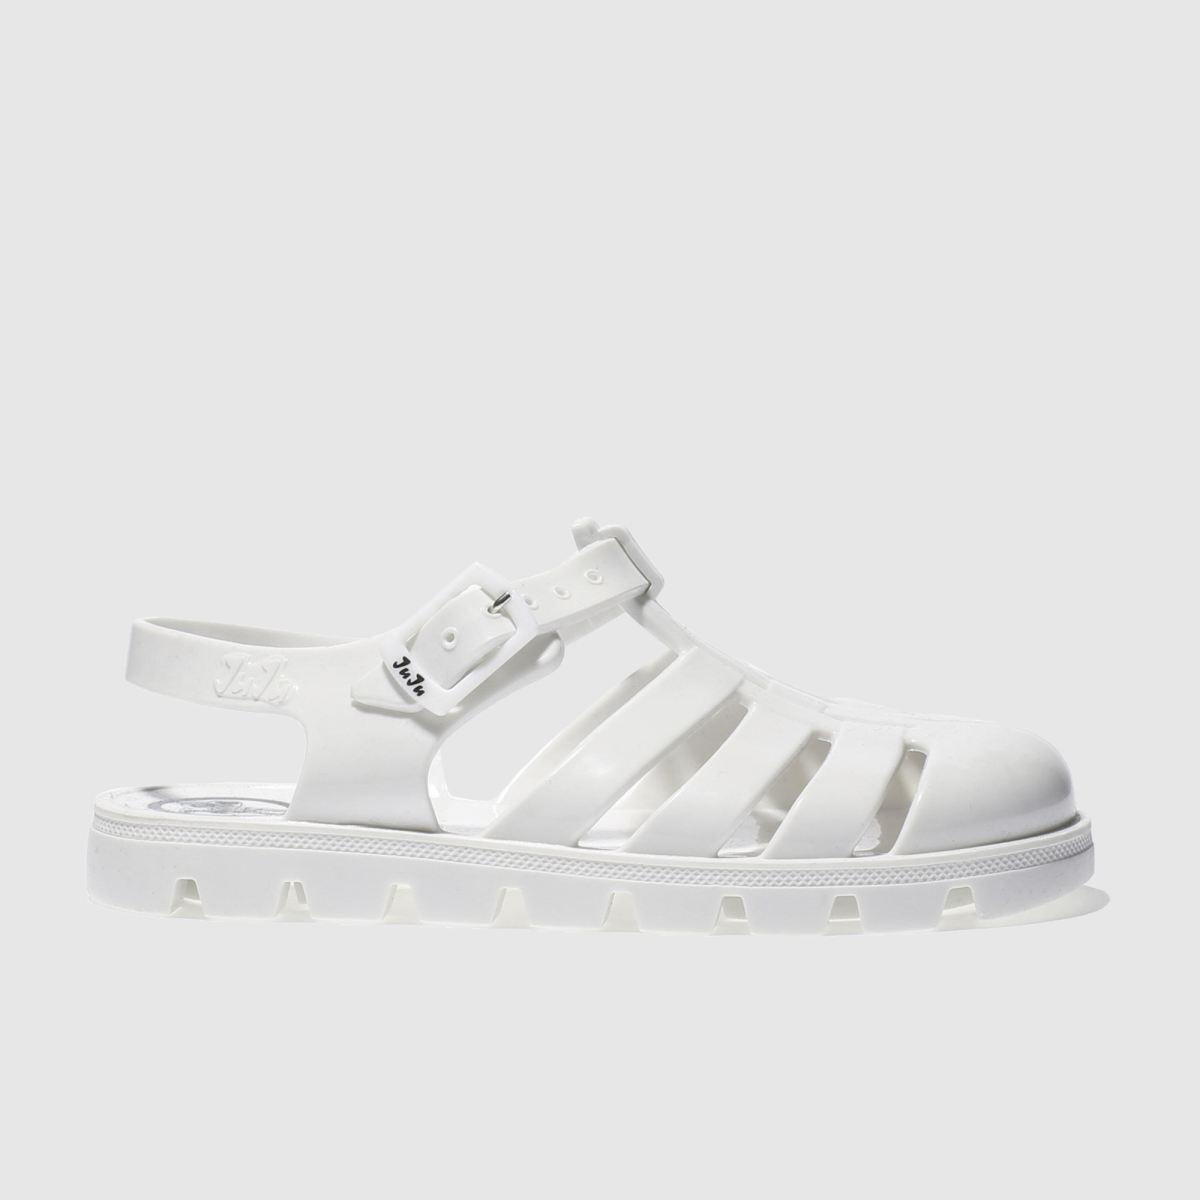 juju jellies Juju Jellies White Maxi Girls Junior Sandals